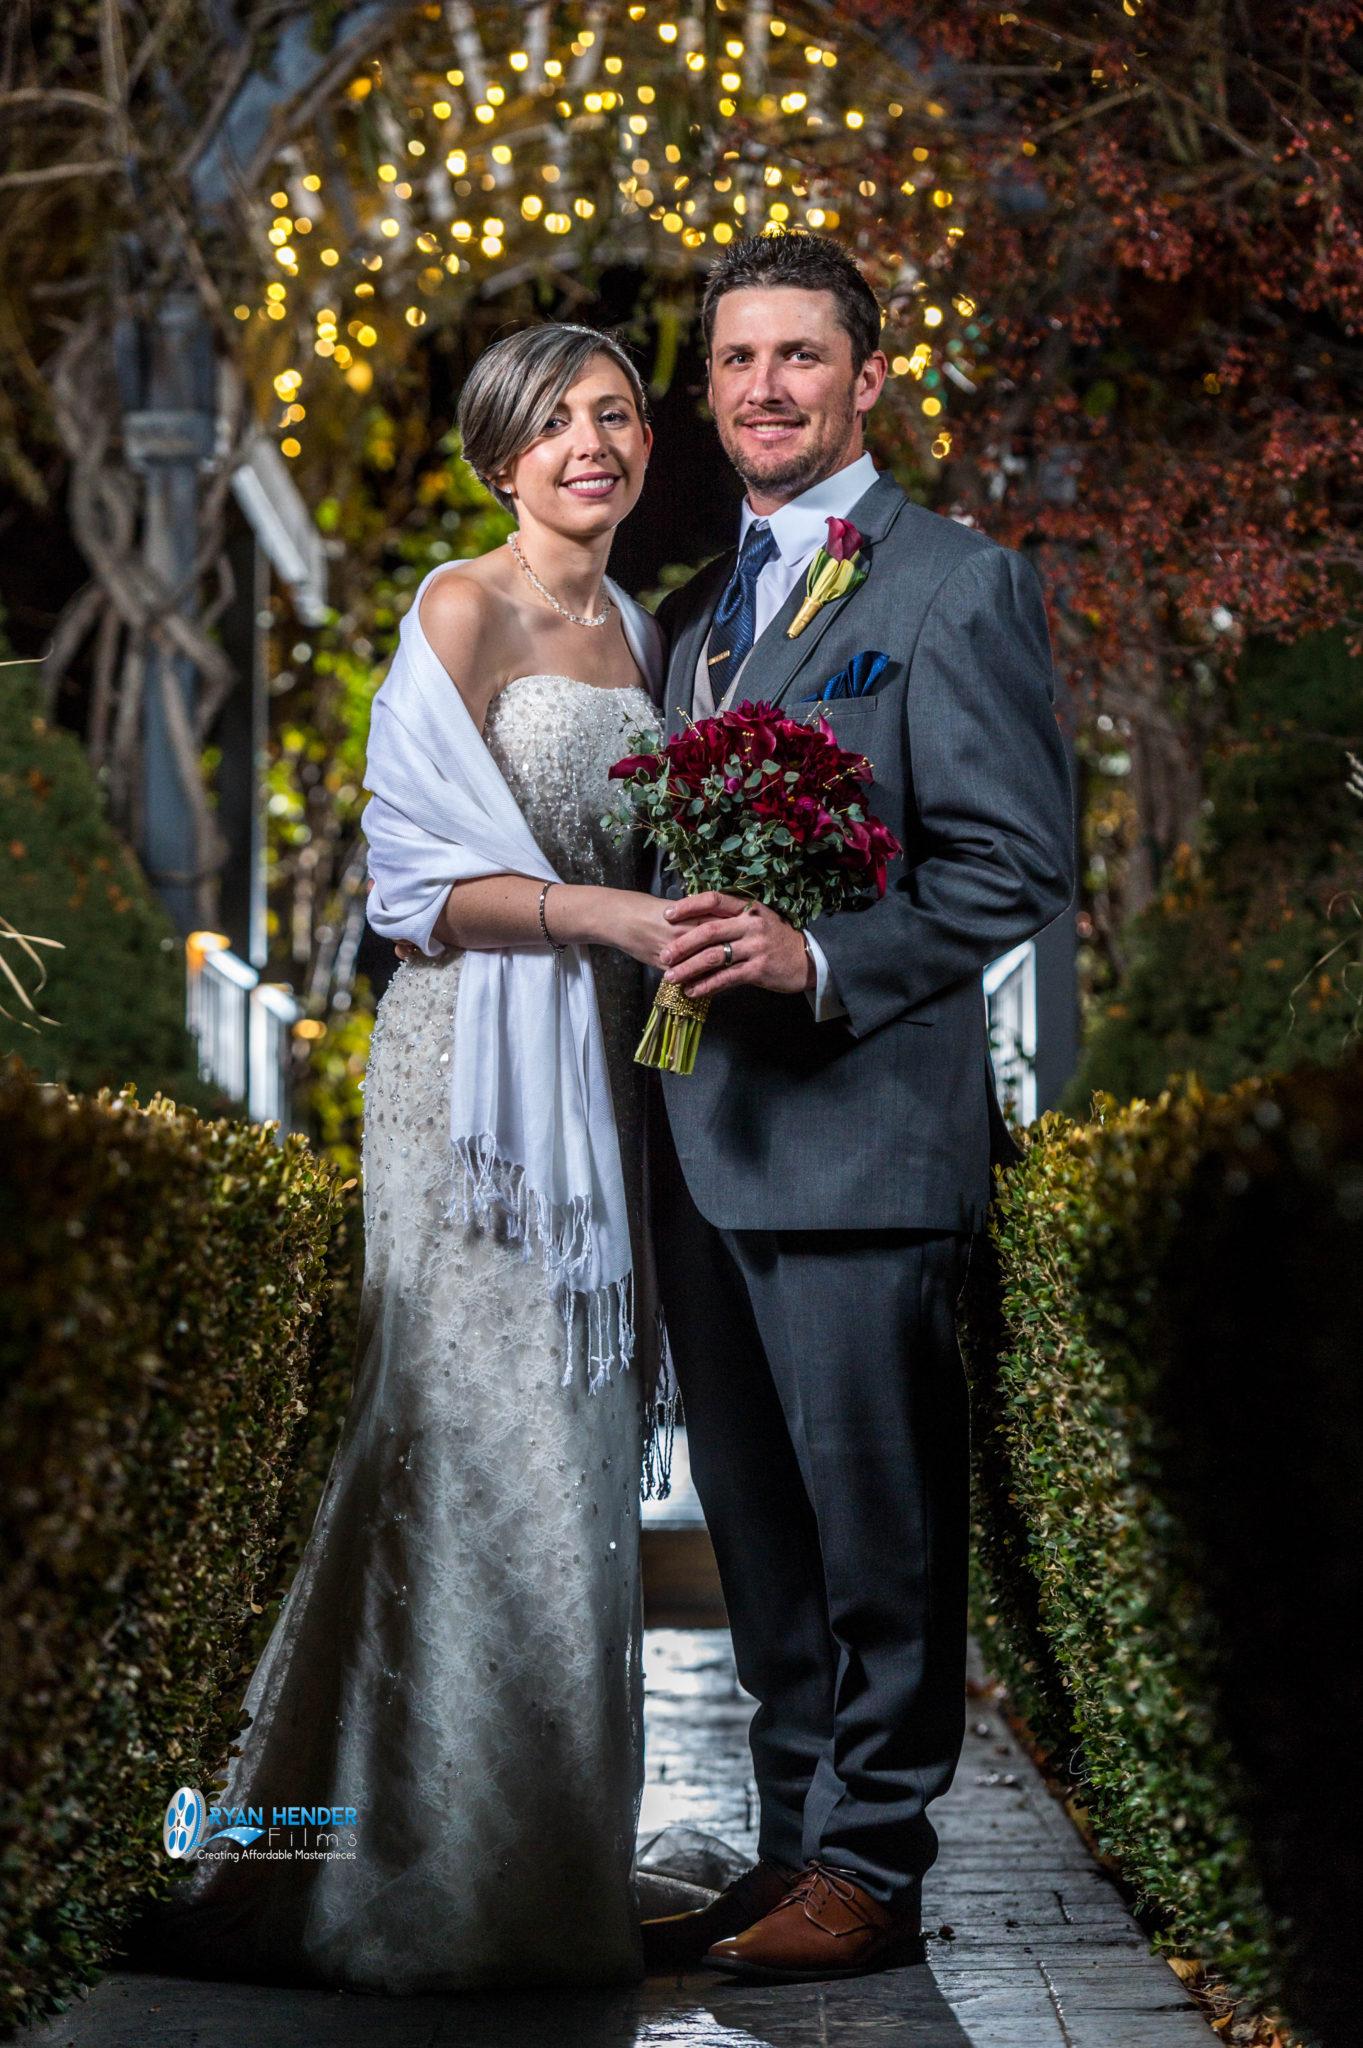 wedding photography utah Ryan hender films